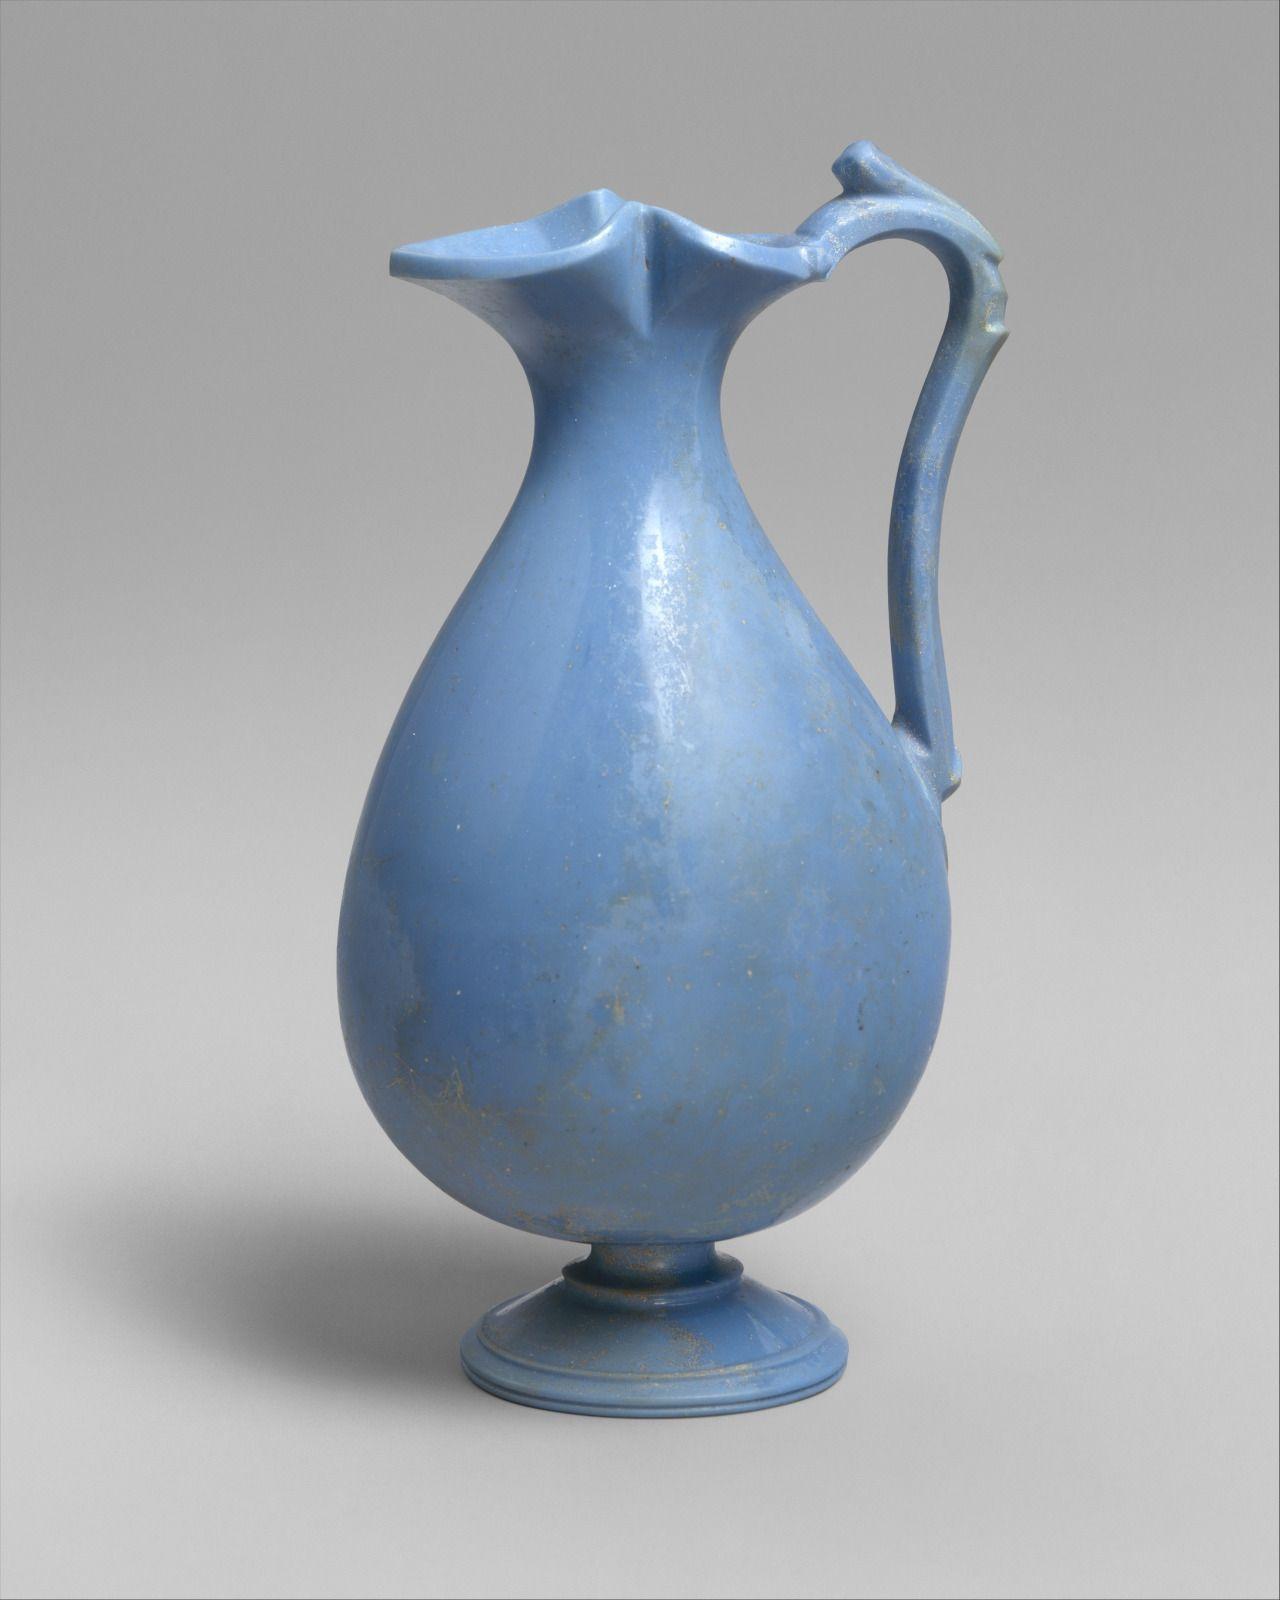 Roman, Glass oinochoe, 1st century BC-1st century AD (source).